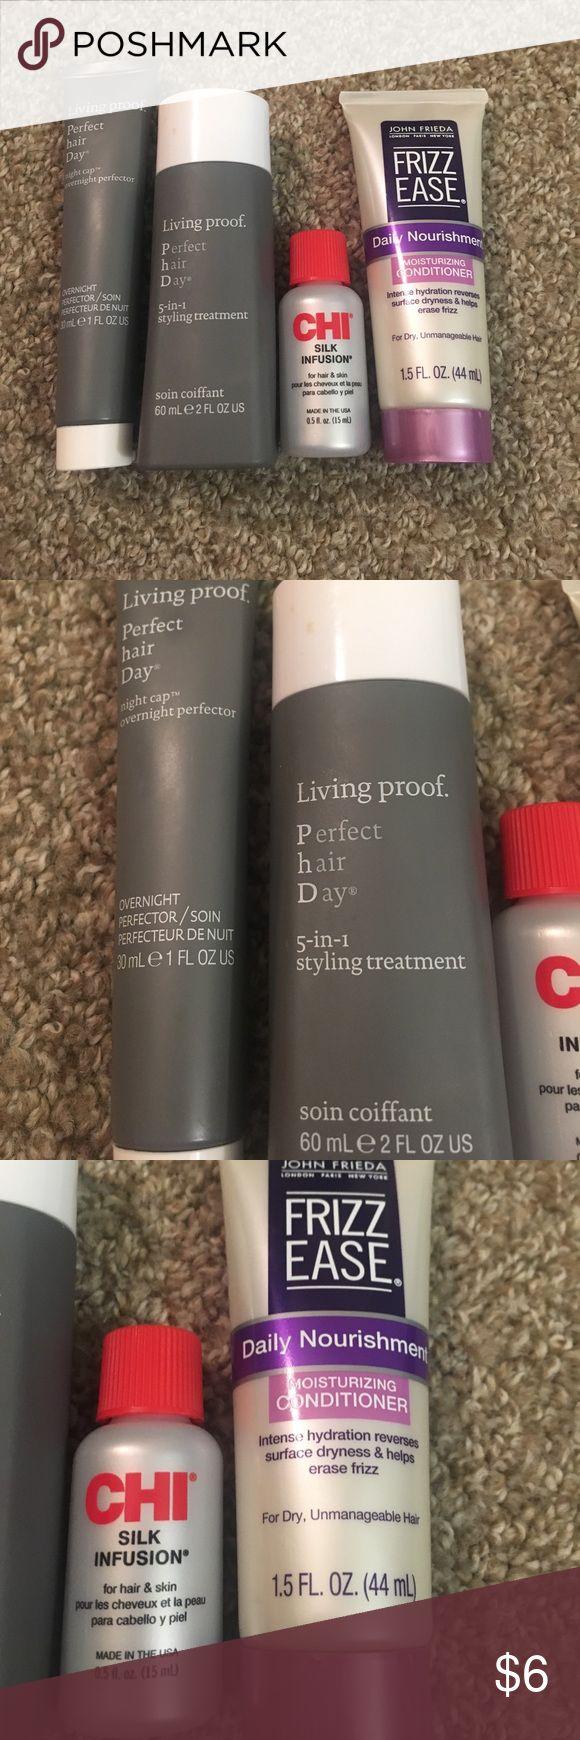 Hair care samples Living Proof, Chi and John Frieda Makeup